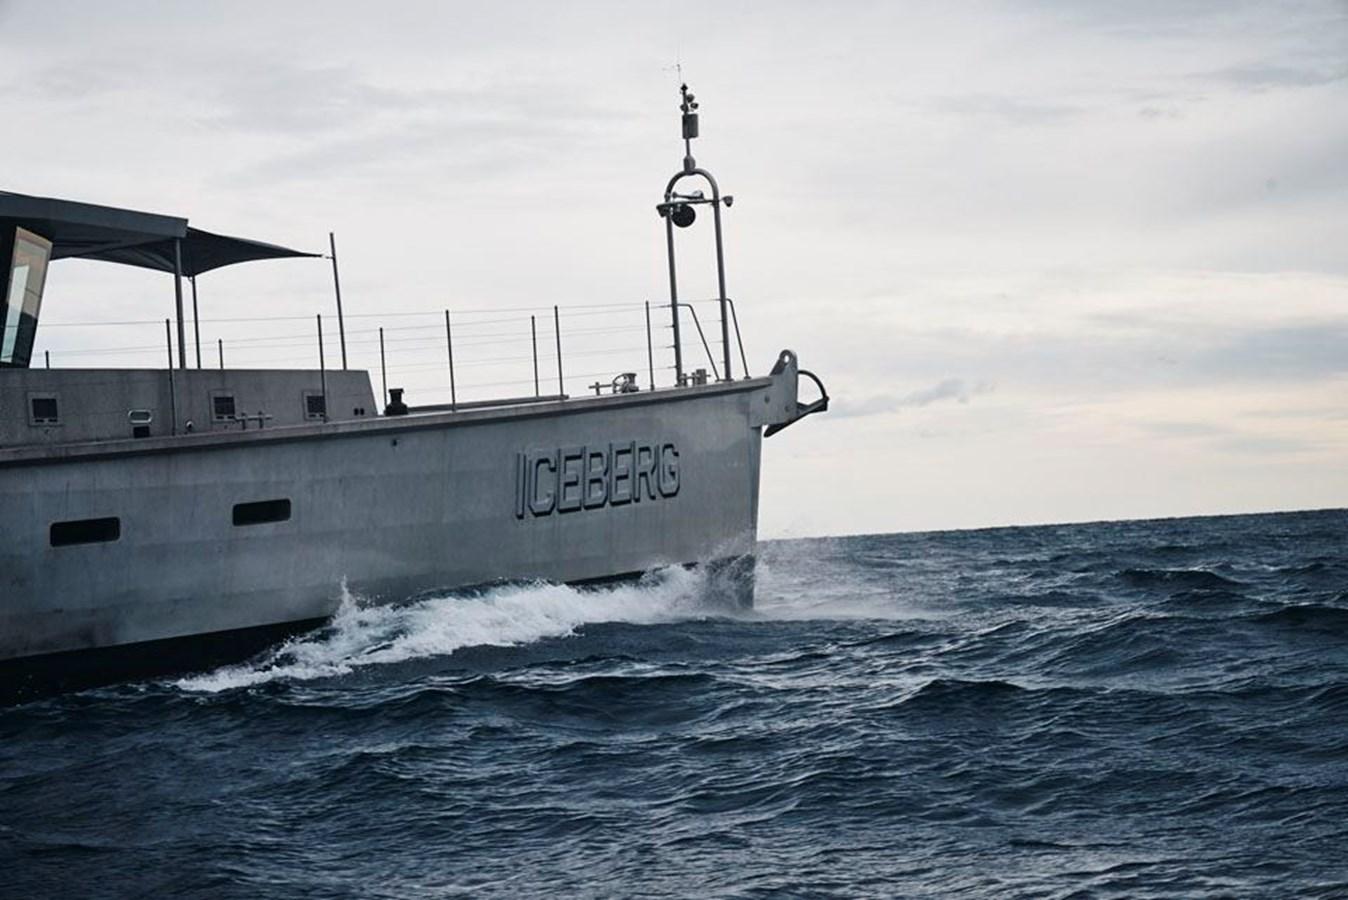 fpb-97-82 2014 CIRCA MARINE FPB 97 Motor Yacht 2788442